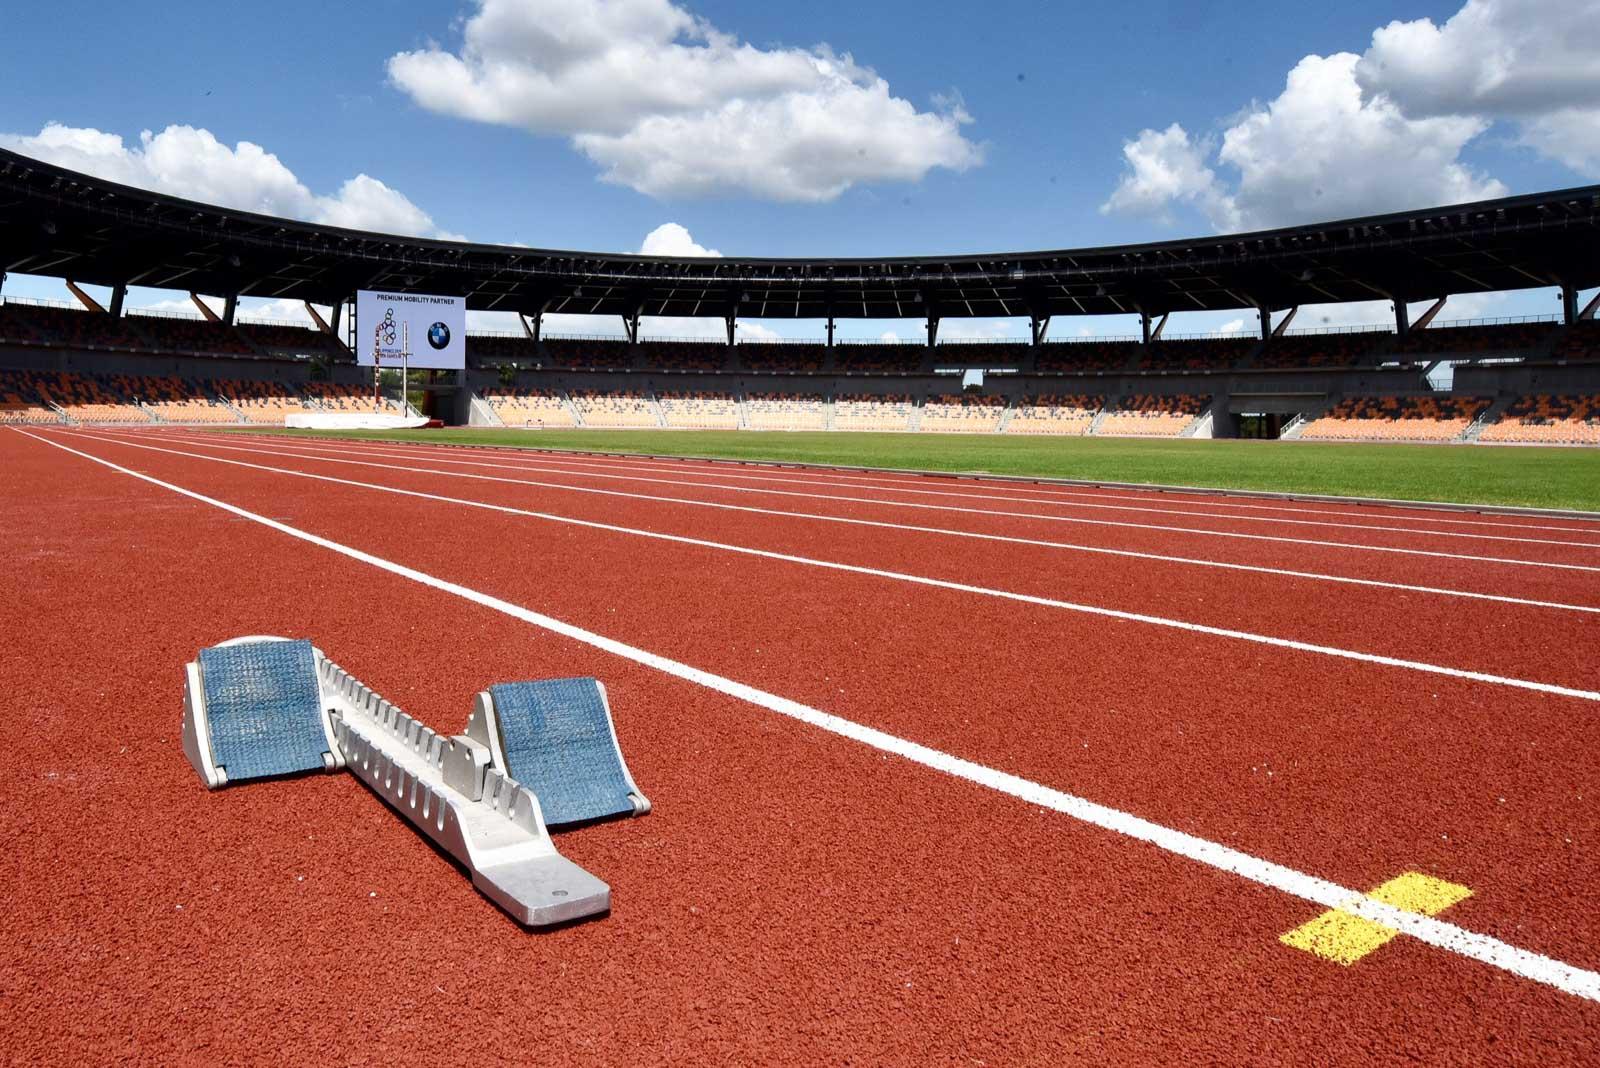 WORLD-CLASS. The athletics stadium has a 400-meter standard track and a 9-lane world-class track and field facility. Photo by Angie de Silva/Rappler